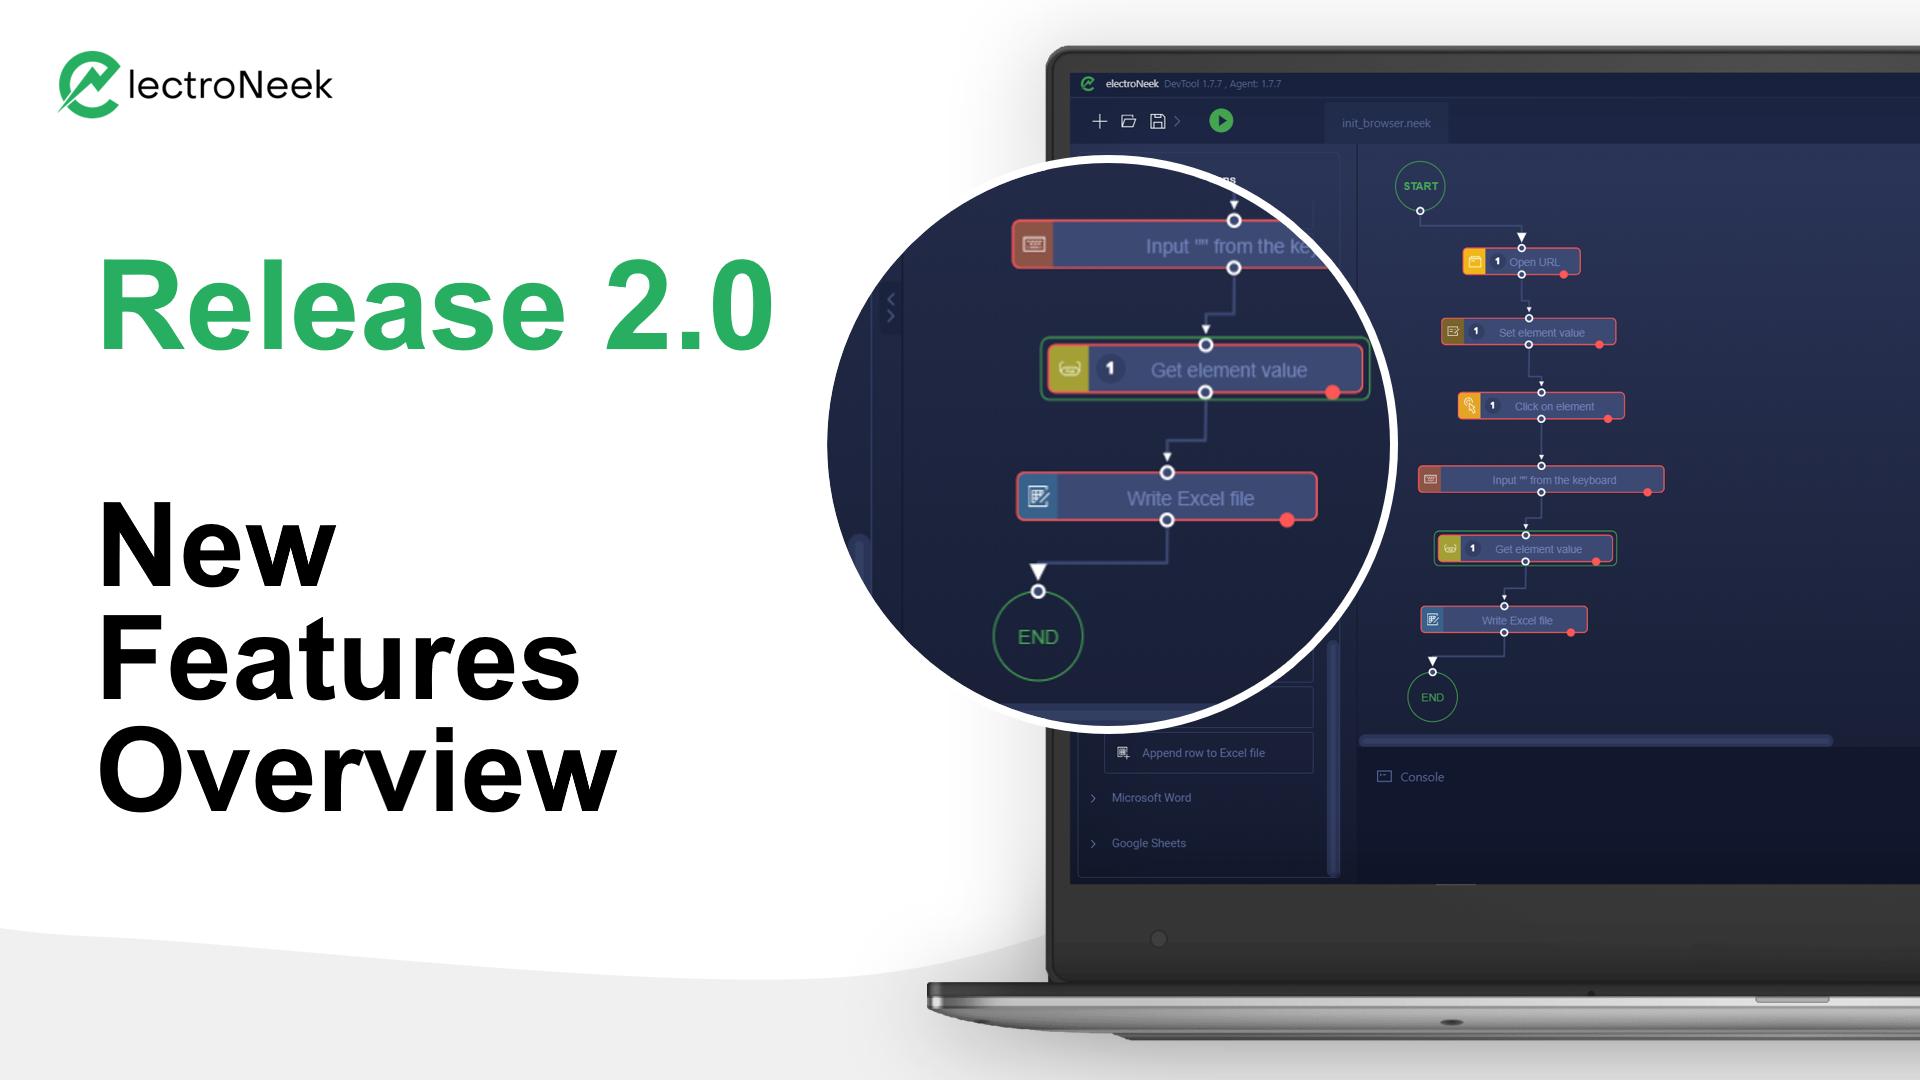 ElectroNeek Enterprise 2.0 platform is released